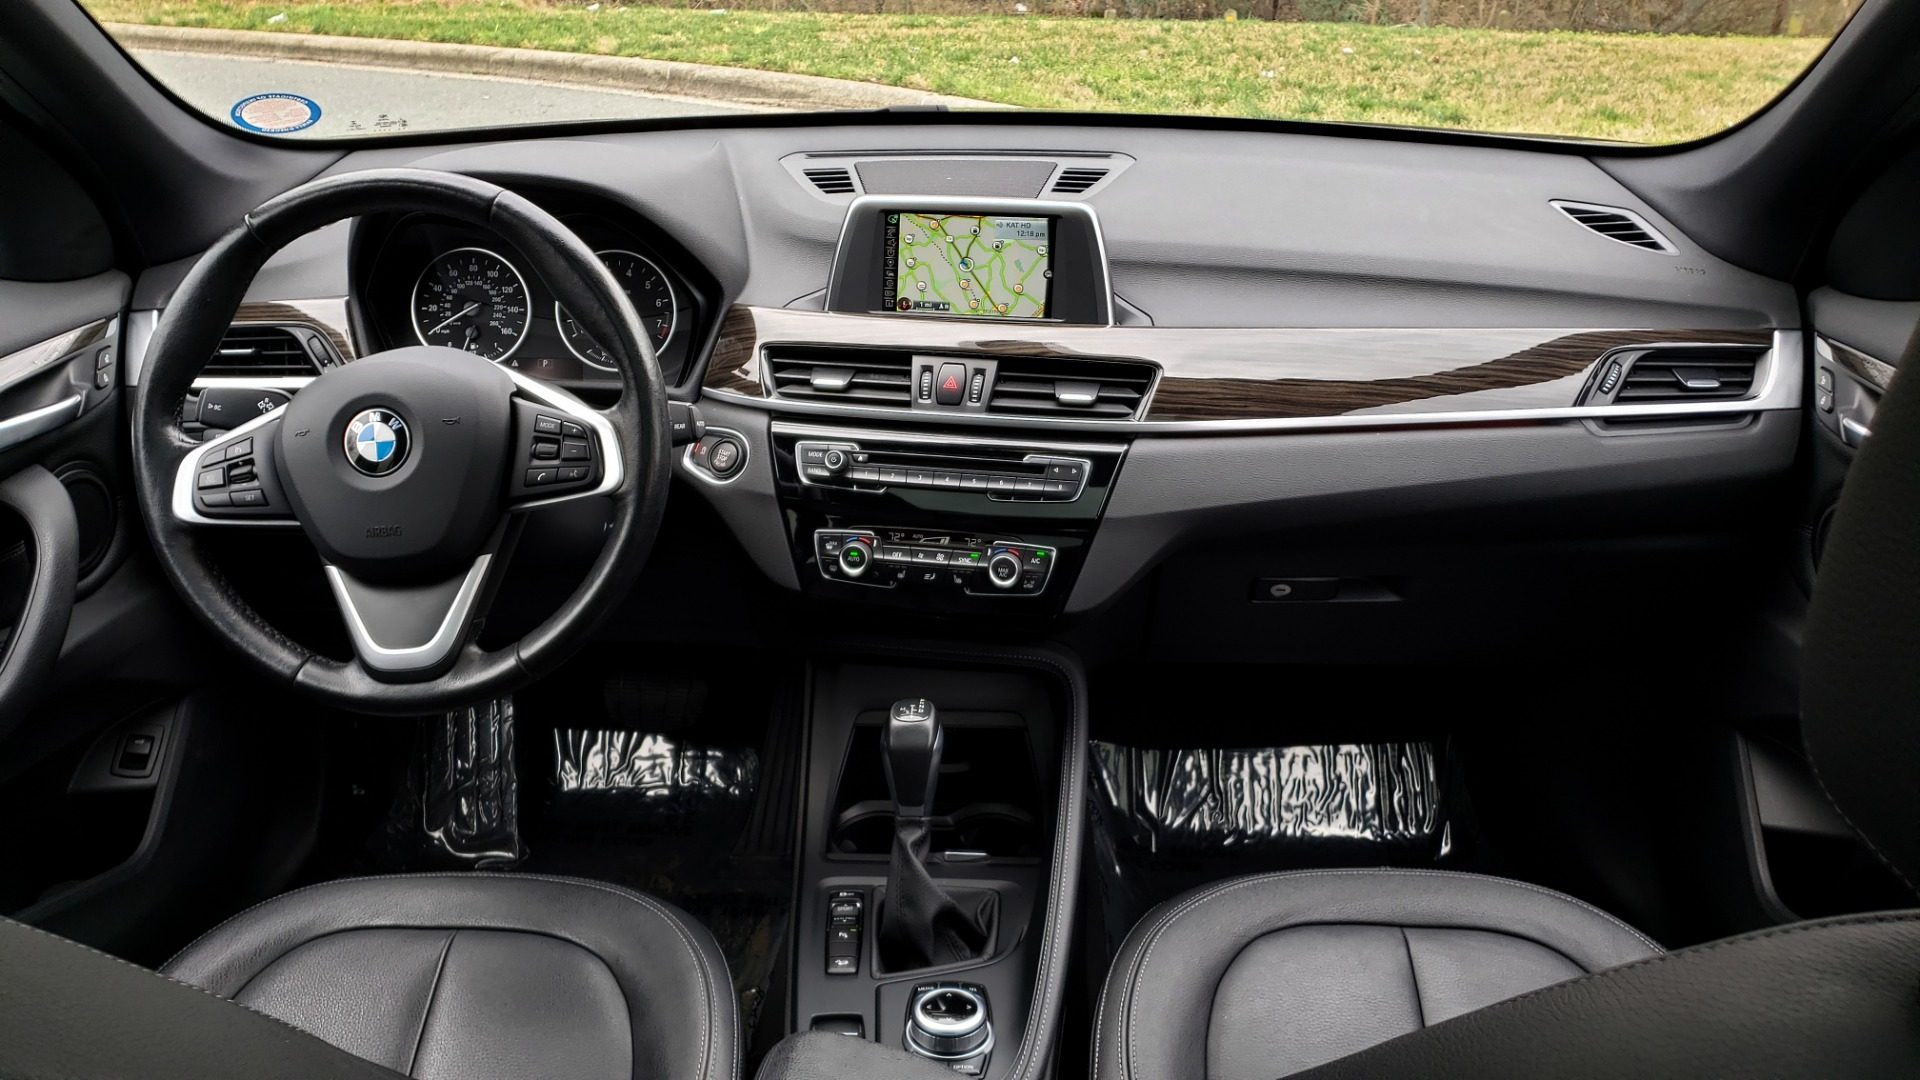 Used 2017 BMW X1 XDRIVE28I / PREM PKG / DRIVER ASST / NAV / CLD WTHR for sale Sold at Formula Imports in Charlotte NC 28227 81